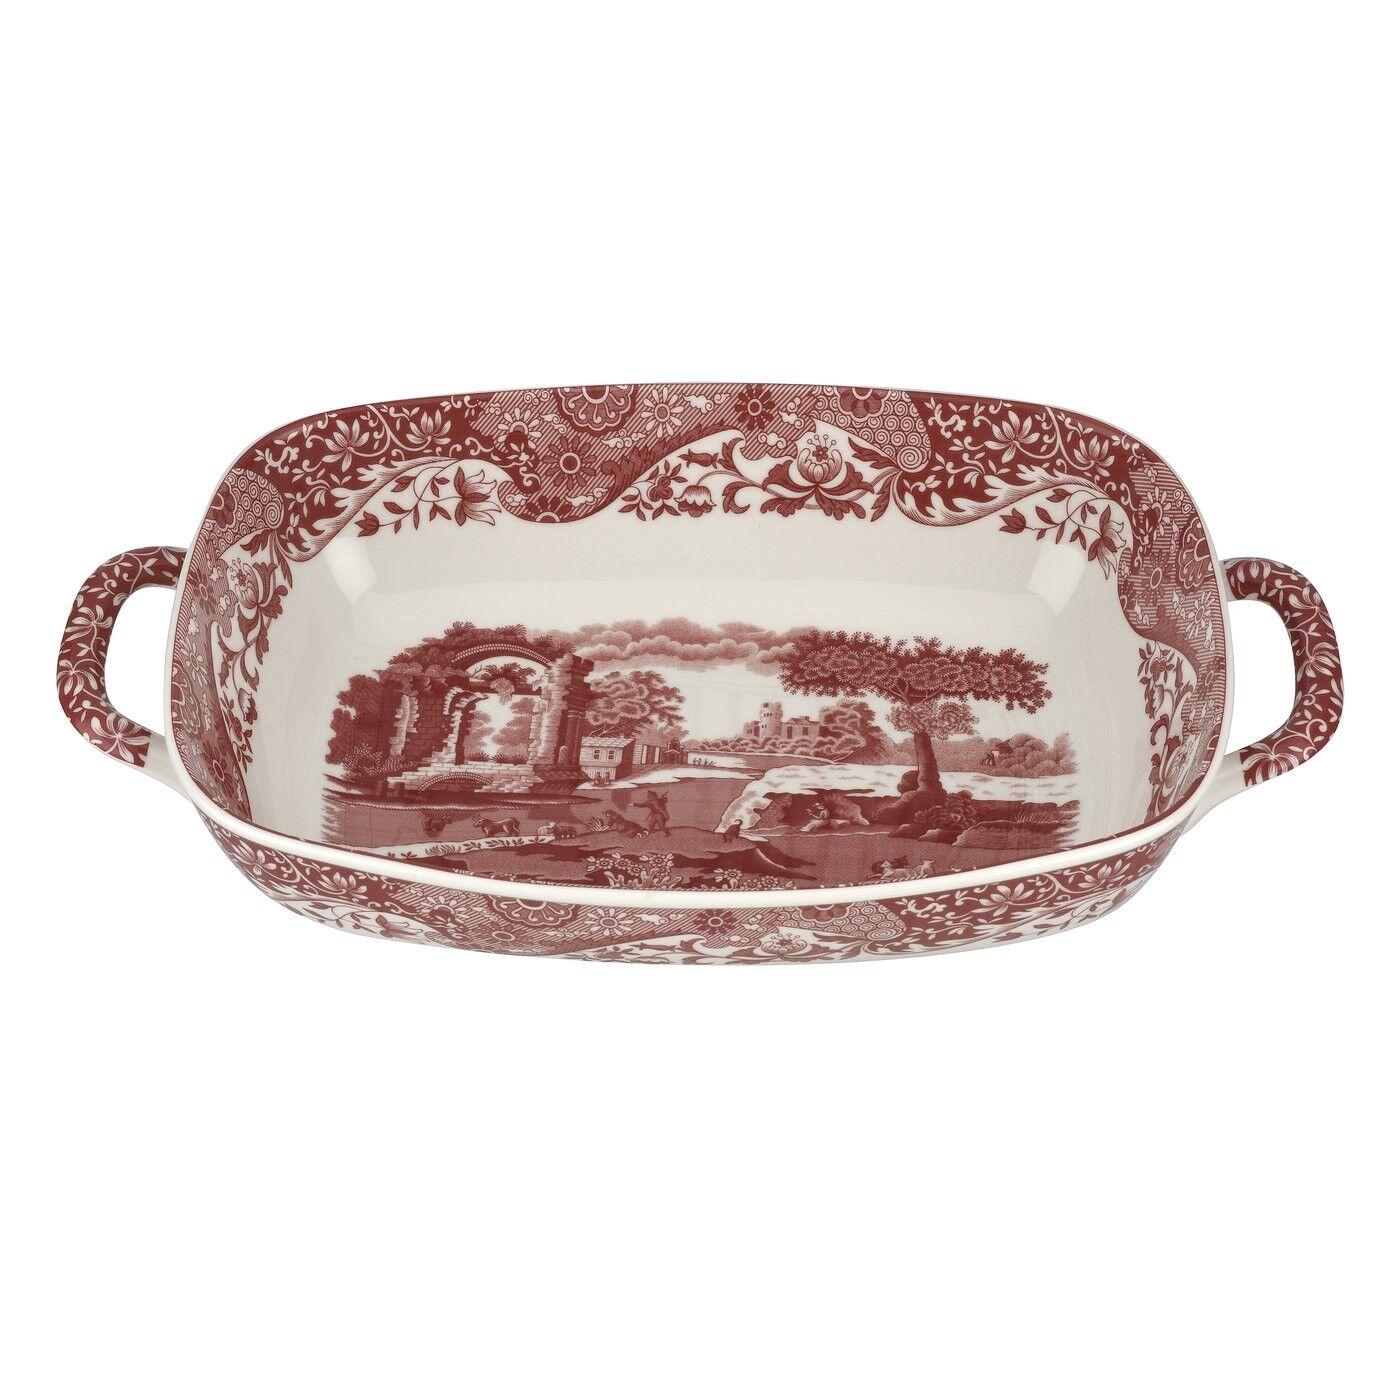 Spode Cranberry Italian Serving Dish, 29x20 cm